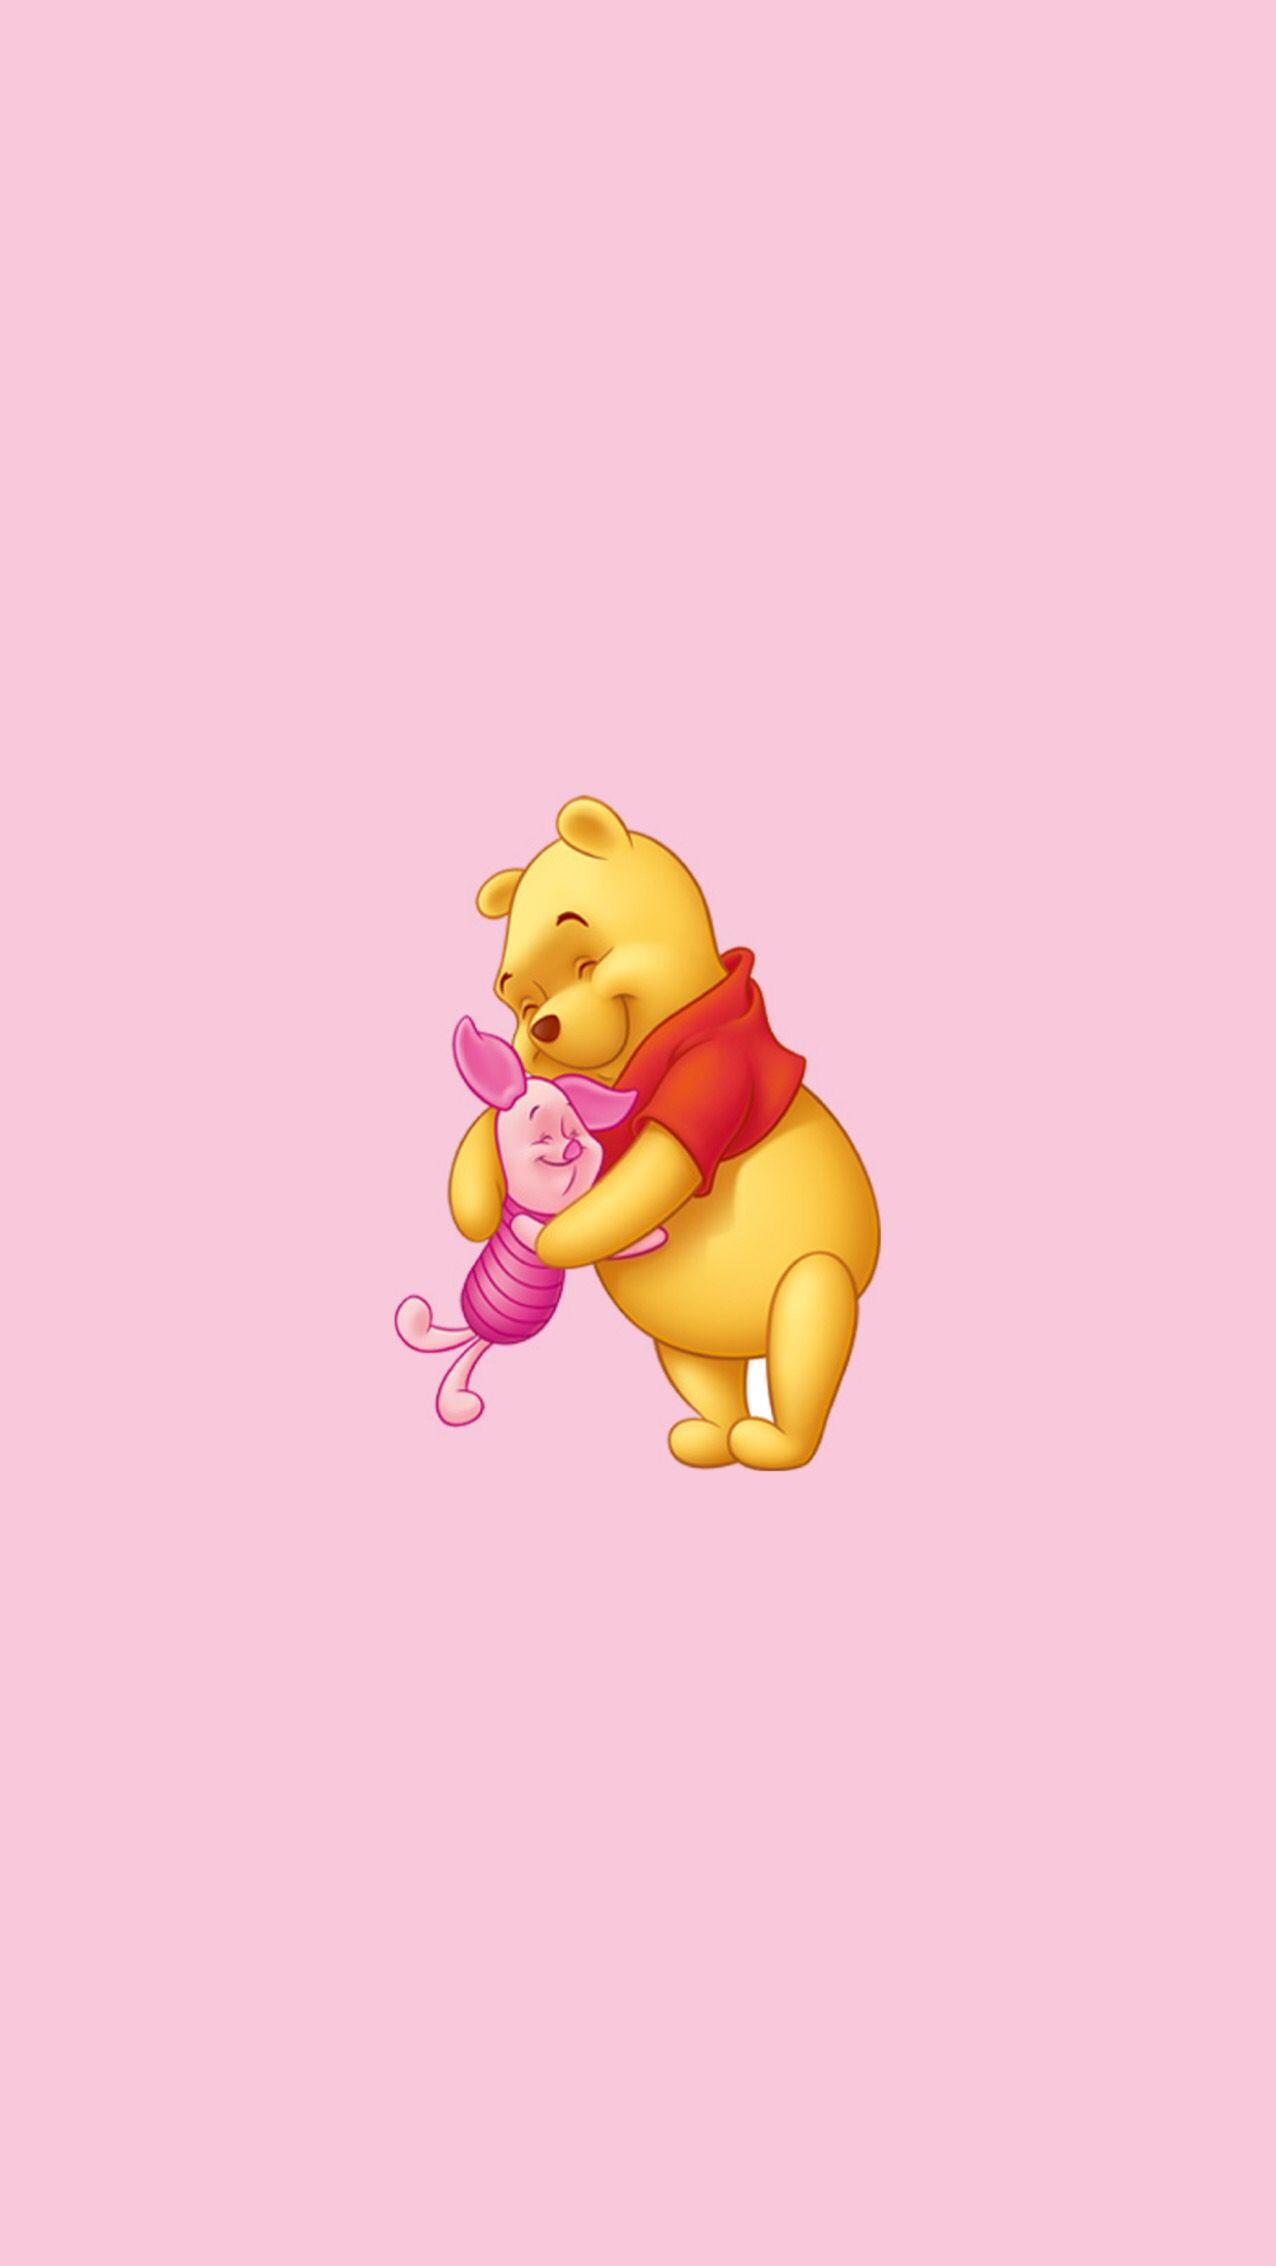 Winnie The Pooh Cute Disney Wallpaper Disney Wallpaper Cute Cartoon Wallpapers